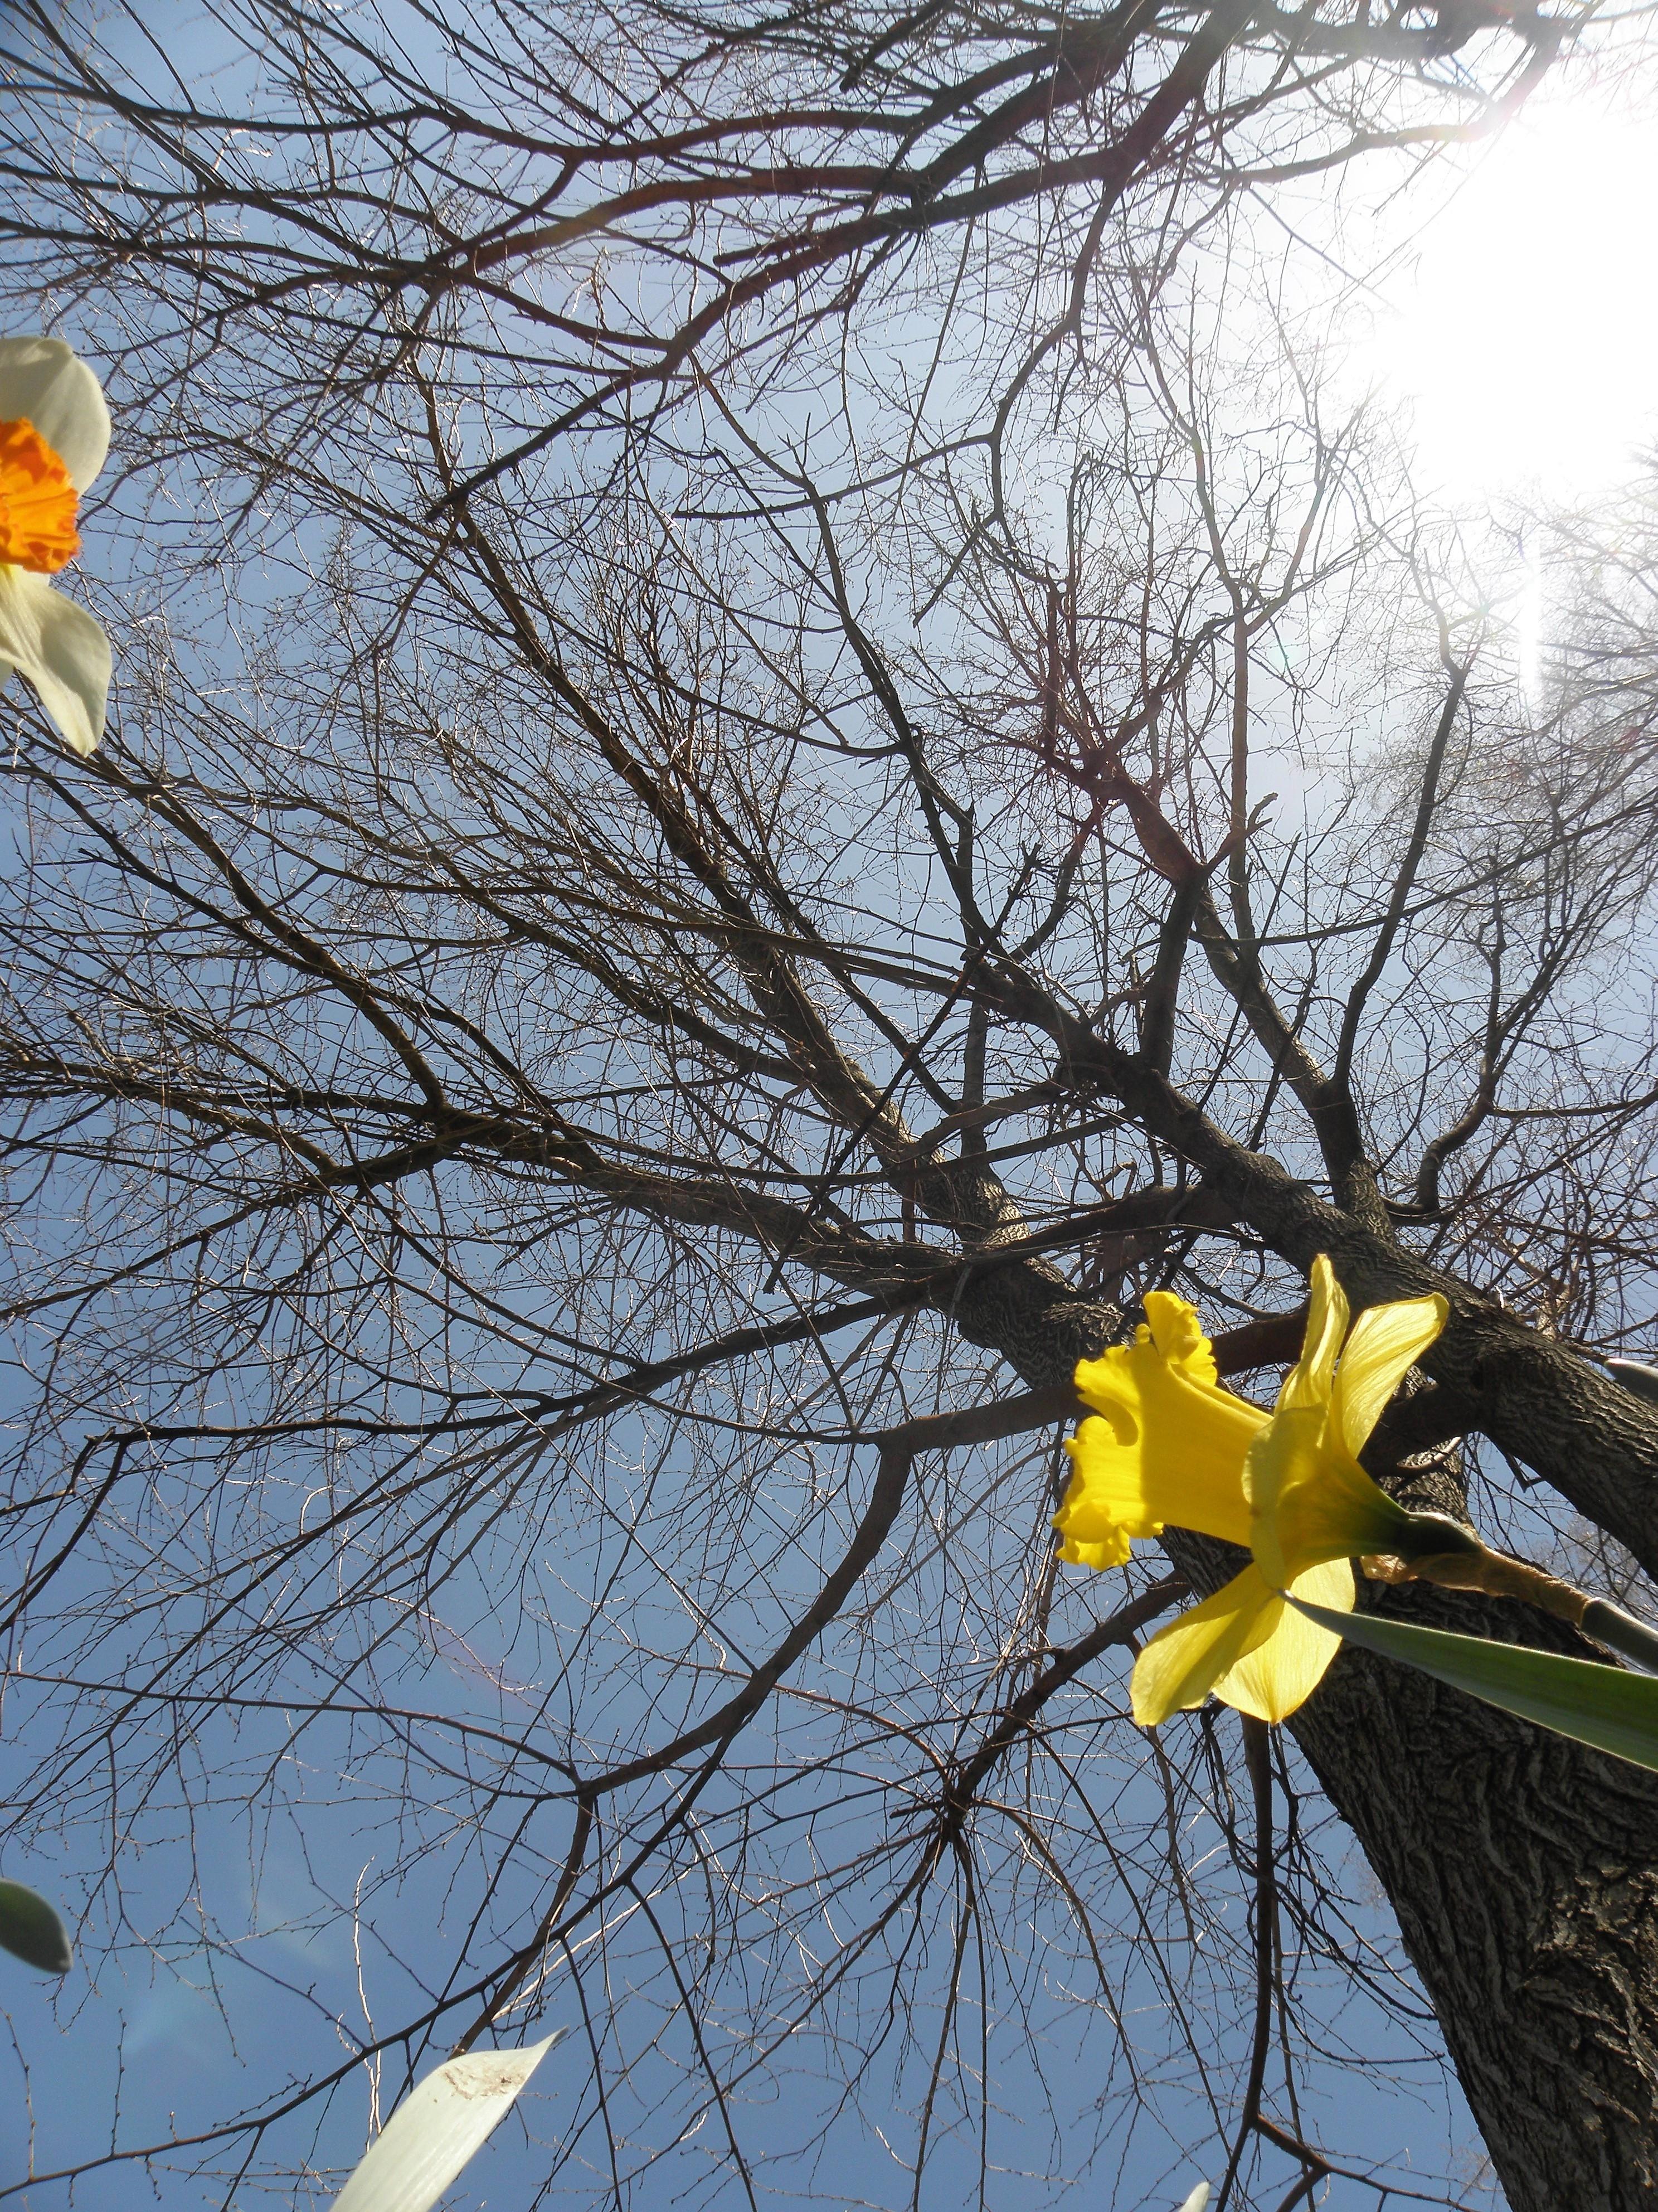 Daffodil & tree, Cleveland, 4/20/20